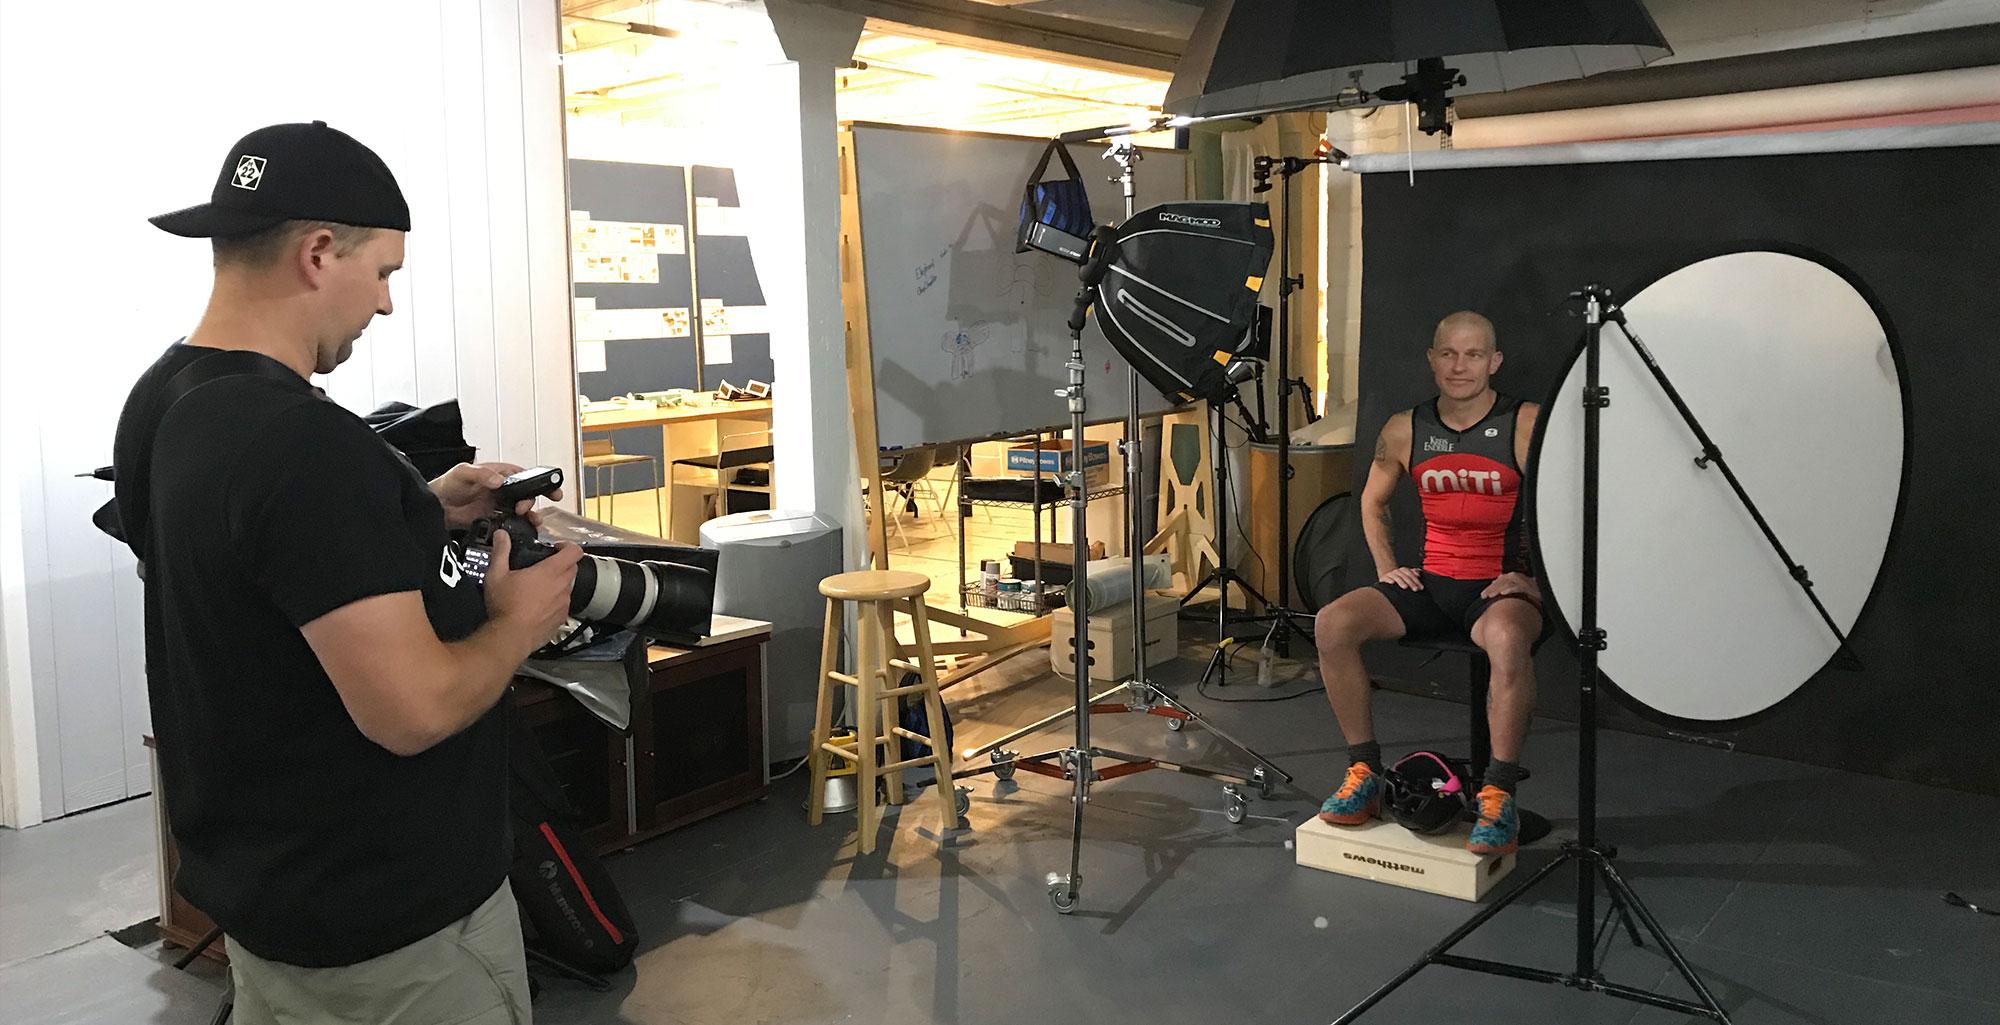 Behind the scenes: TITAN Photoshoot